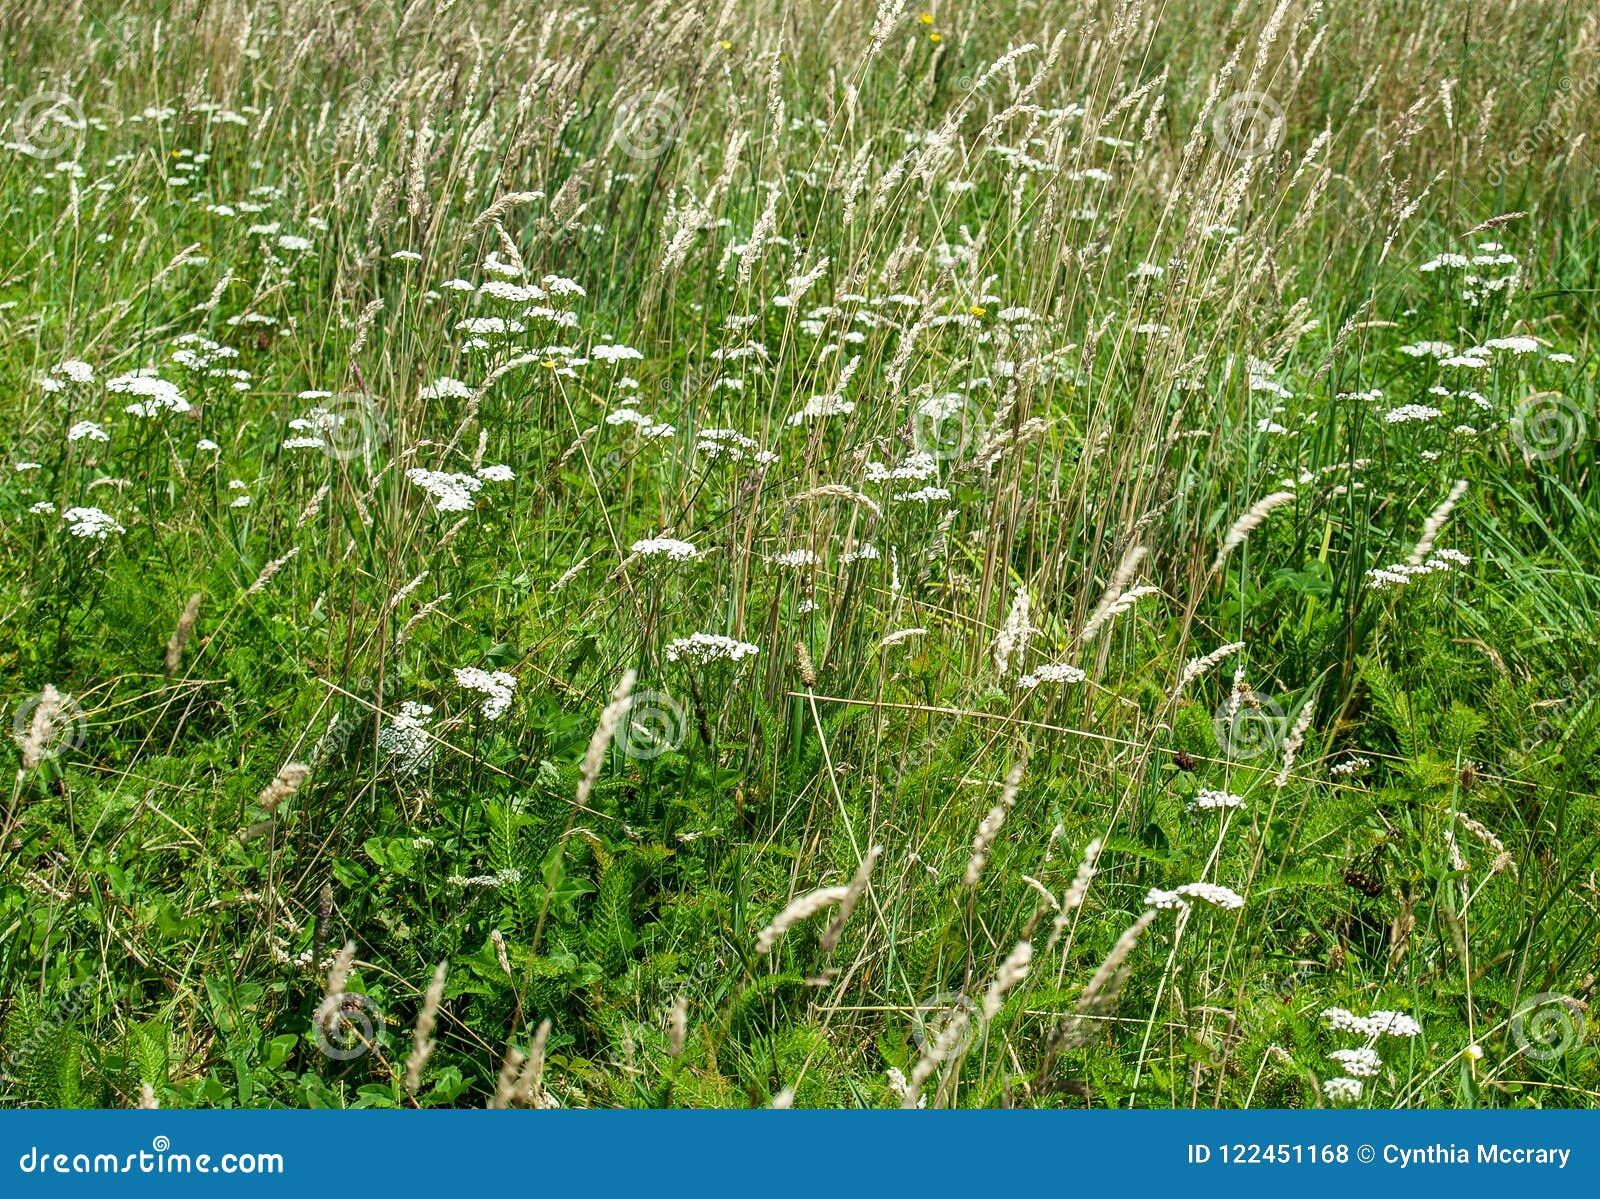 Grayson Highlands Meadow